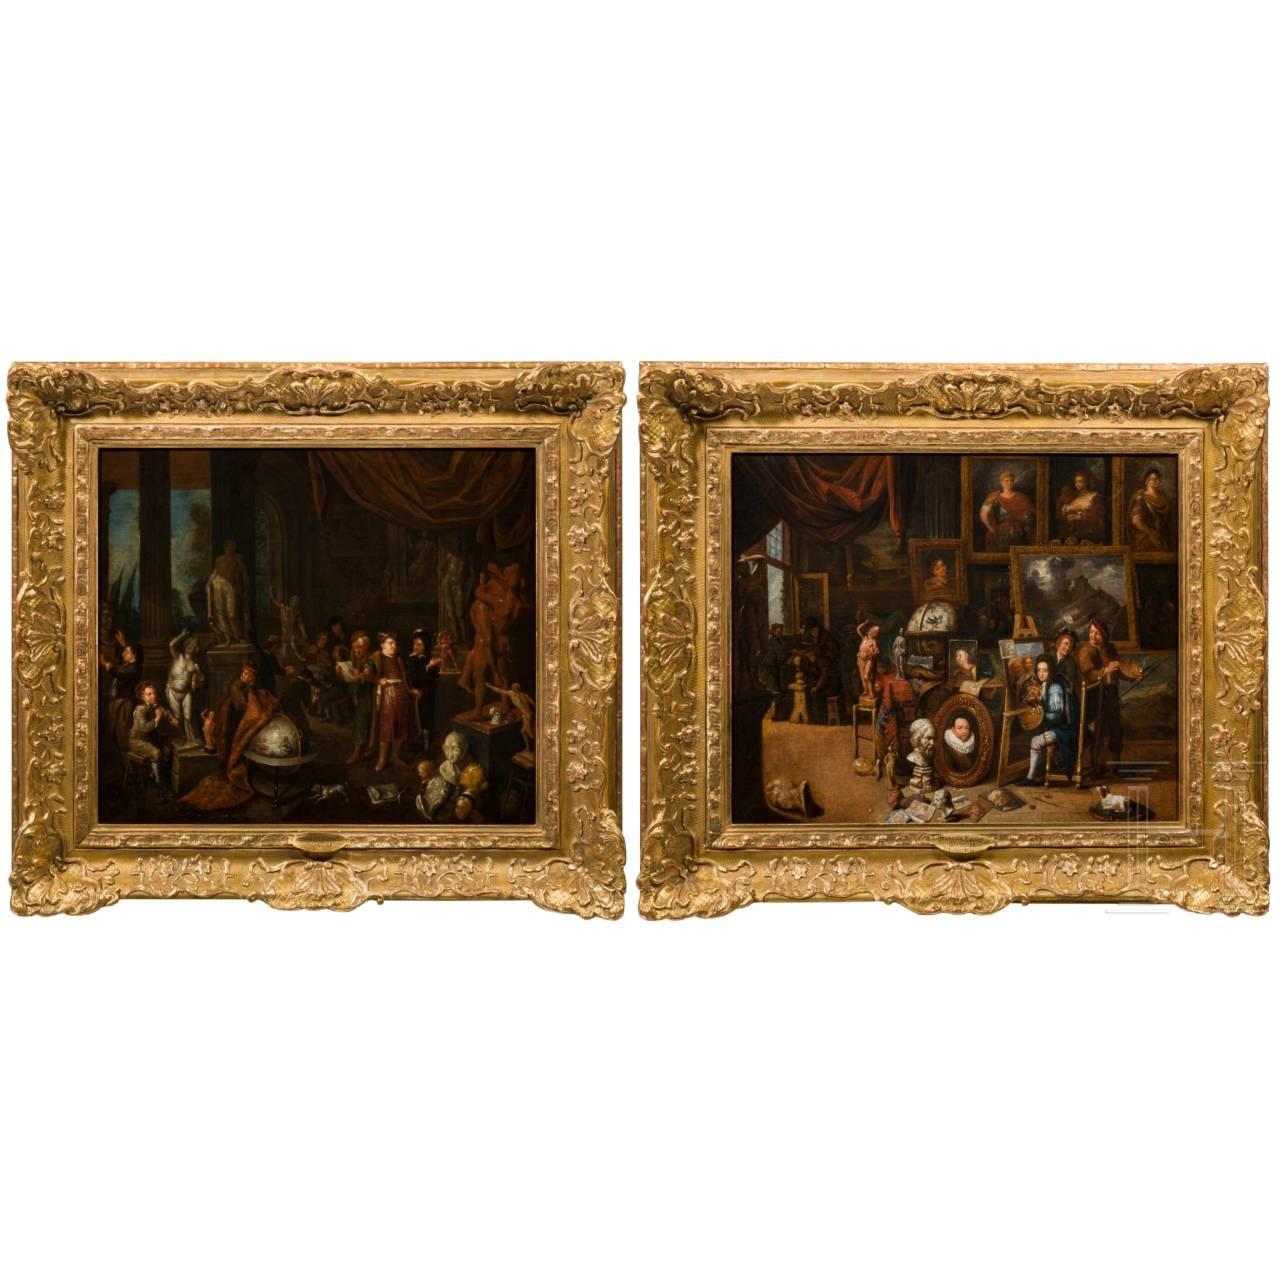 Antwerp Masters – two studio paintings, early 18th century